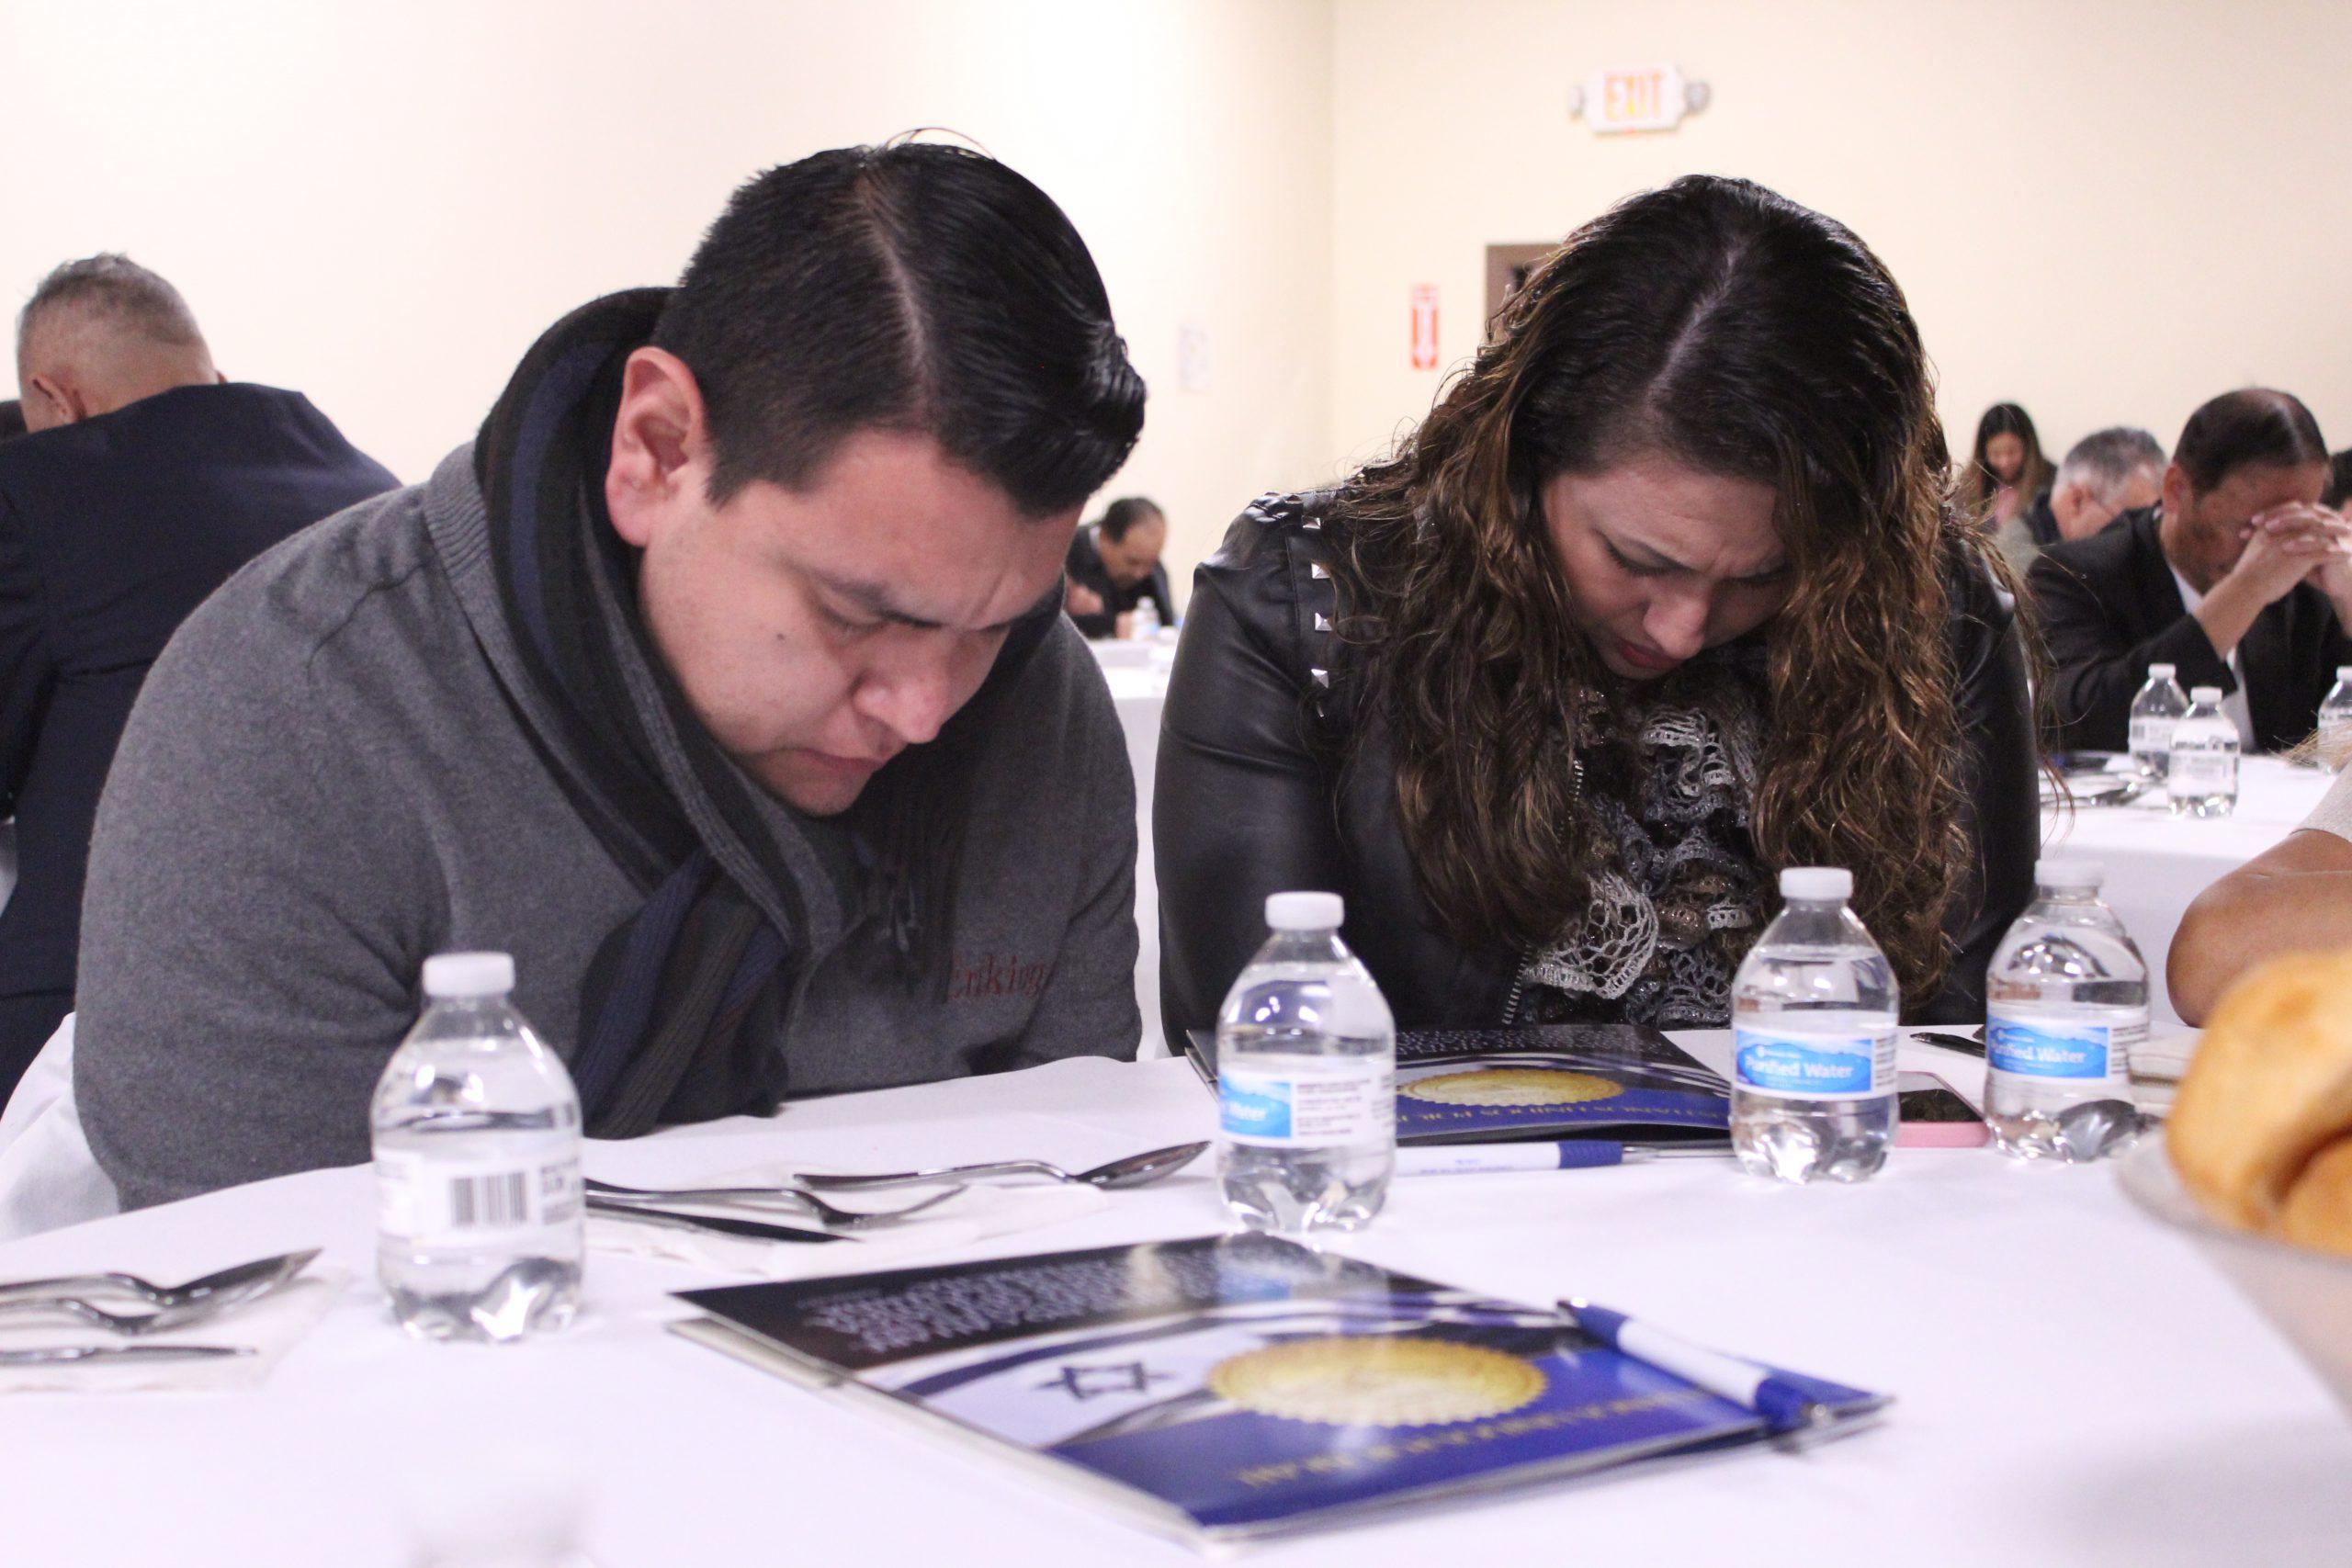 Dec 11th Greenville, SC Spanish Pastors Meeting Dinner